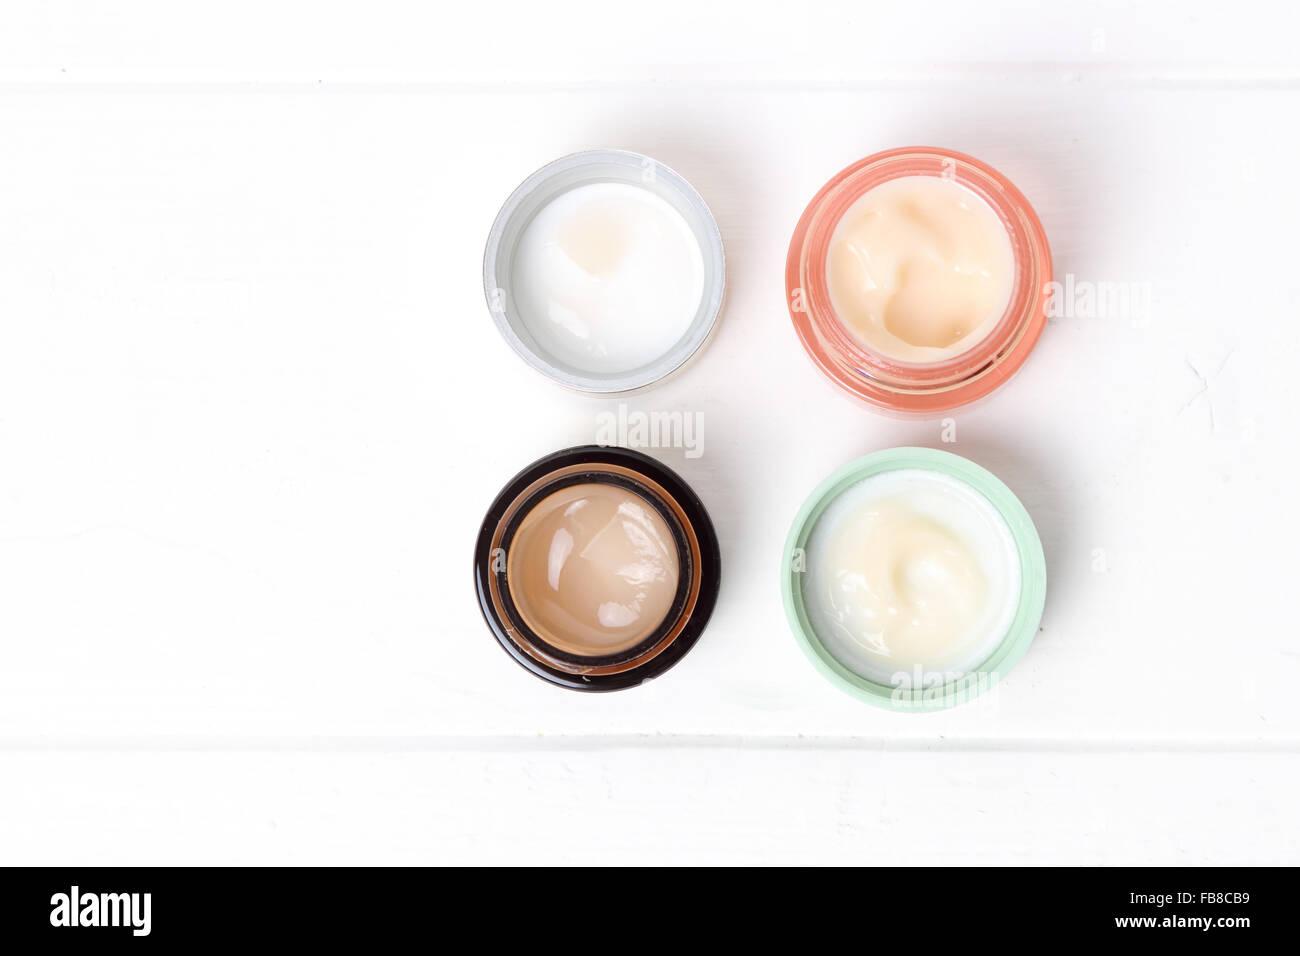 Jars of cosmetic cream - Stock Image